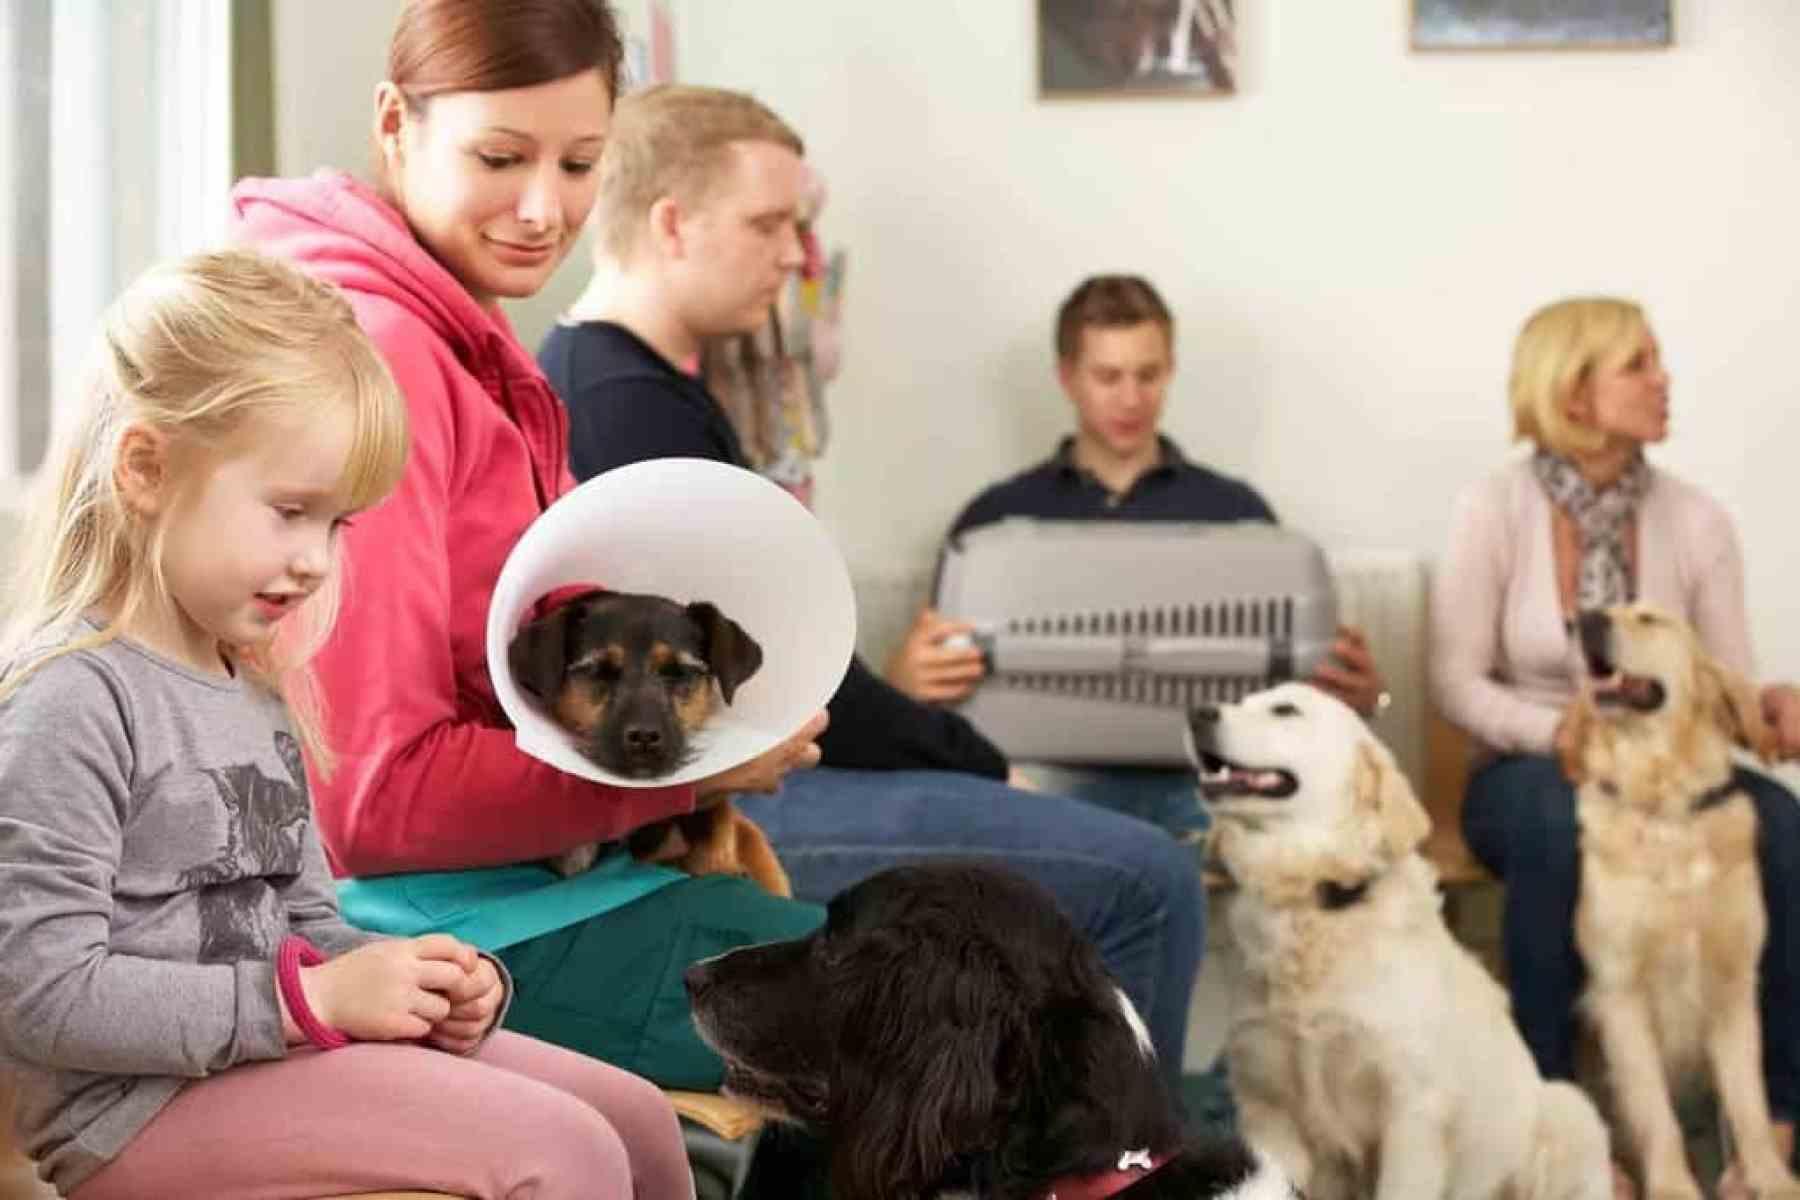 Kastracja sterylizacja psa i kota